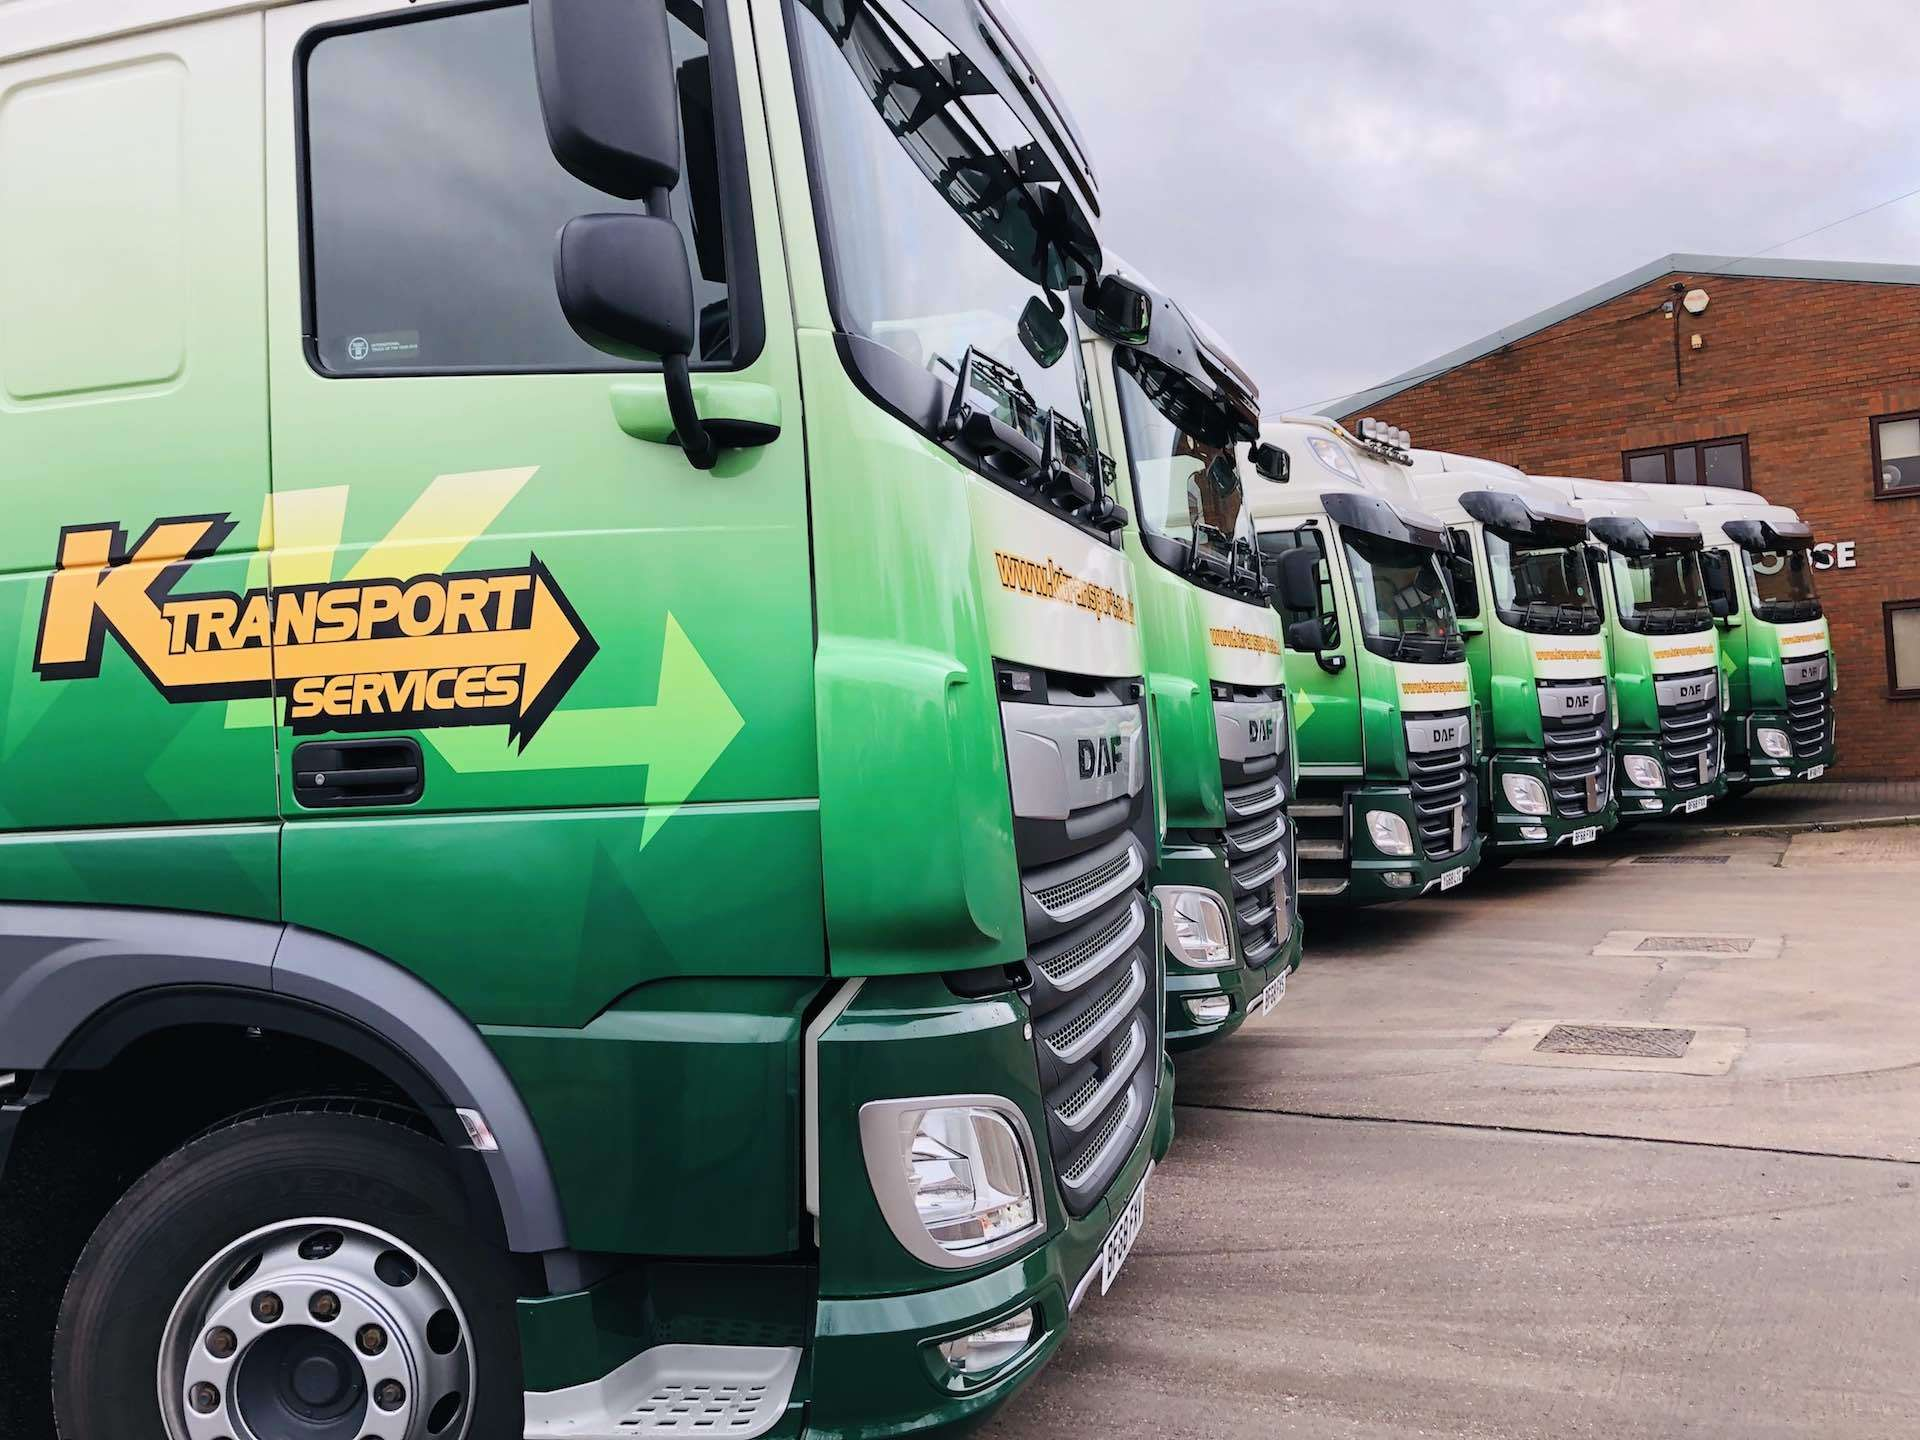 K Transport Services Haulage Lorries